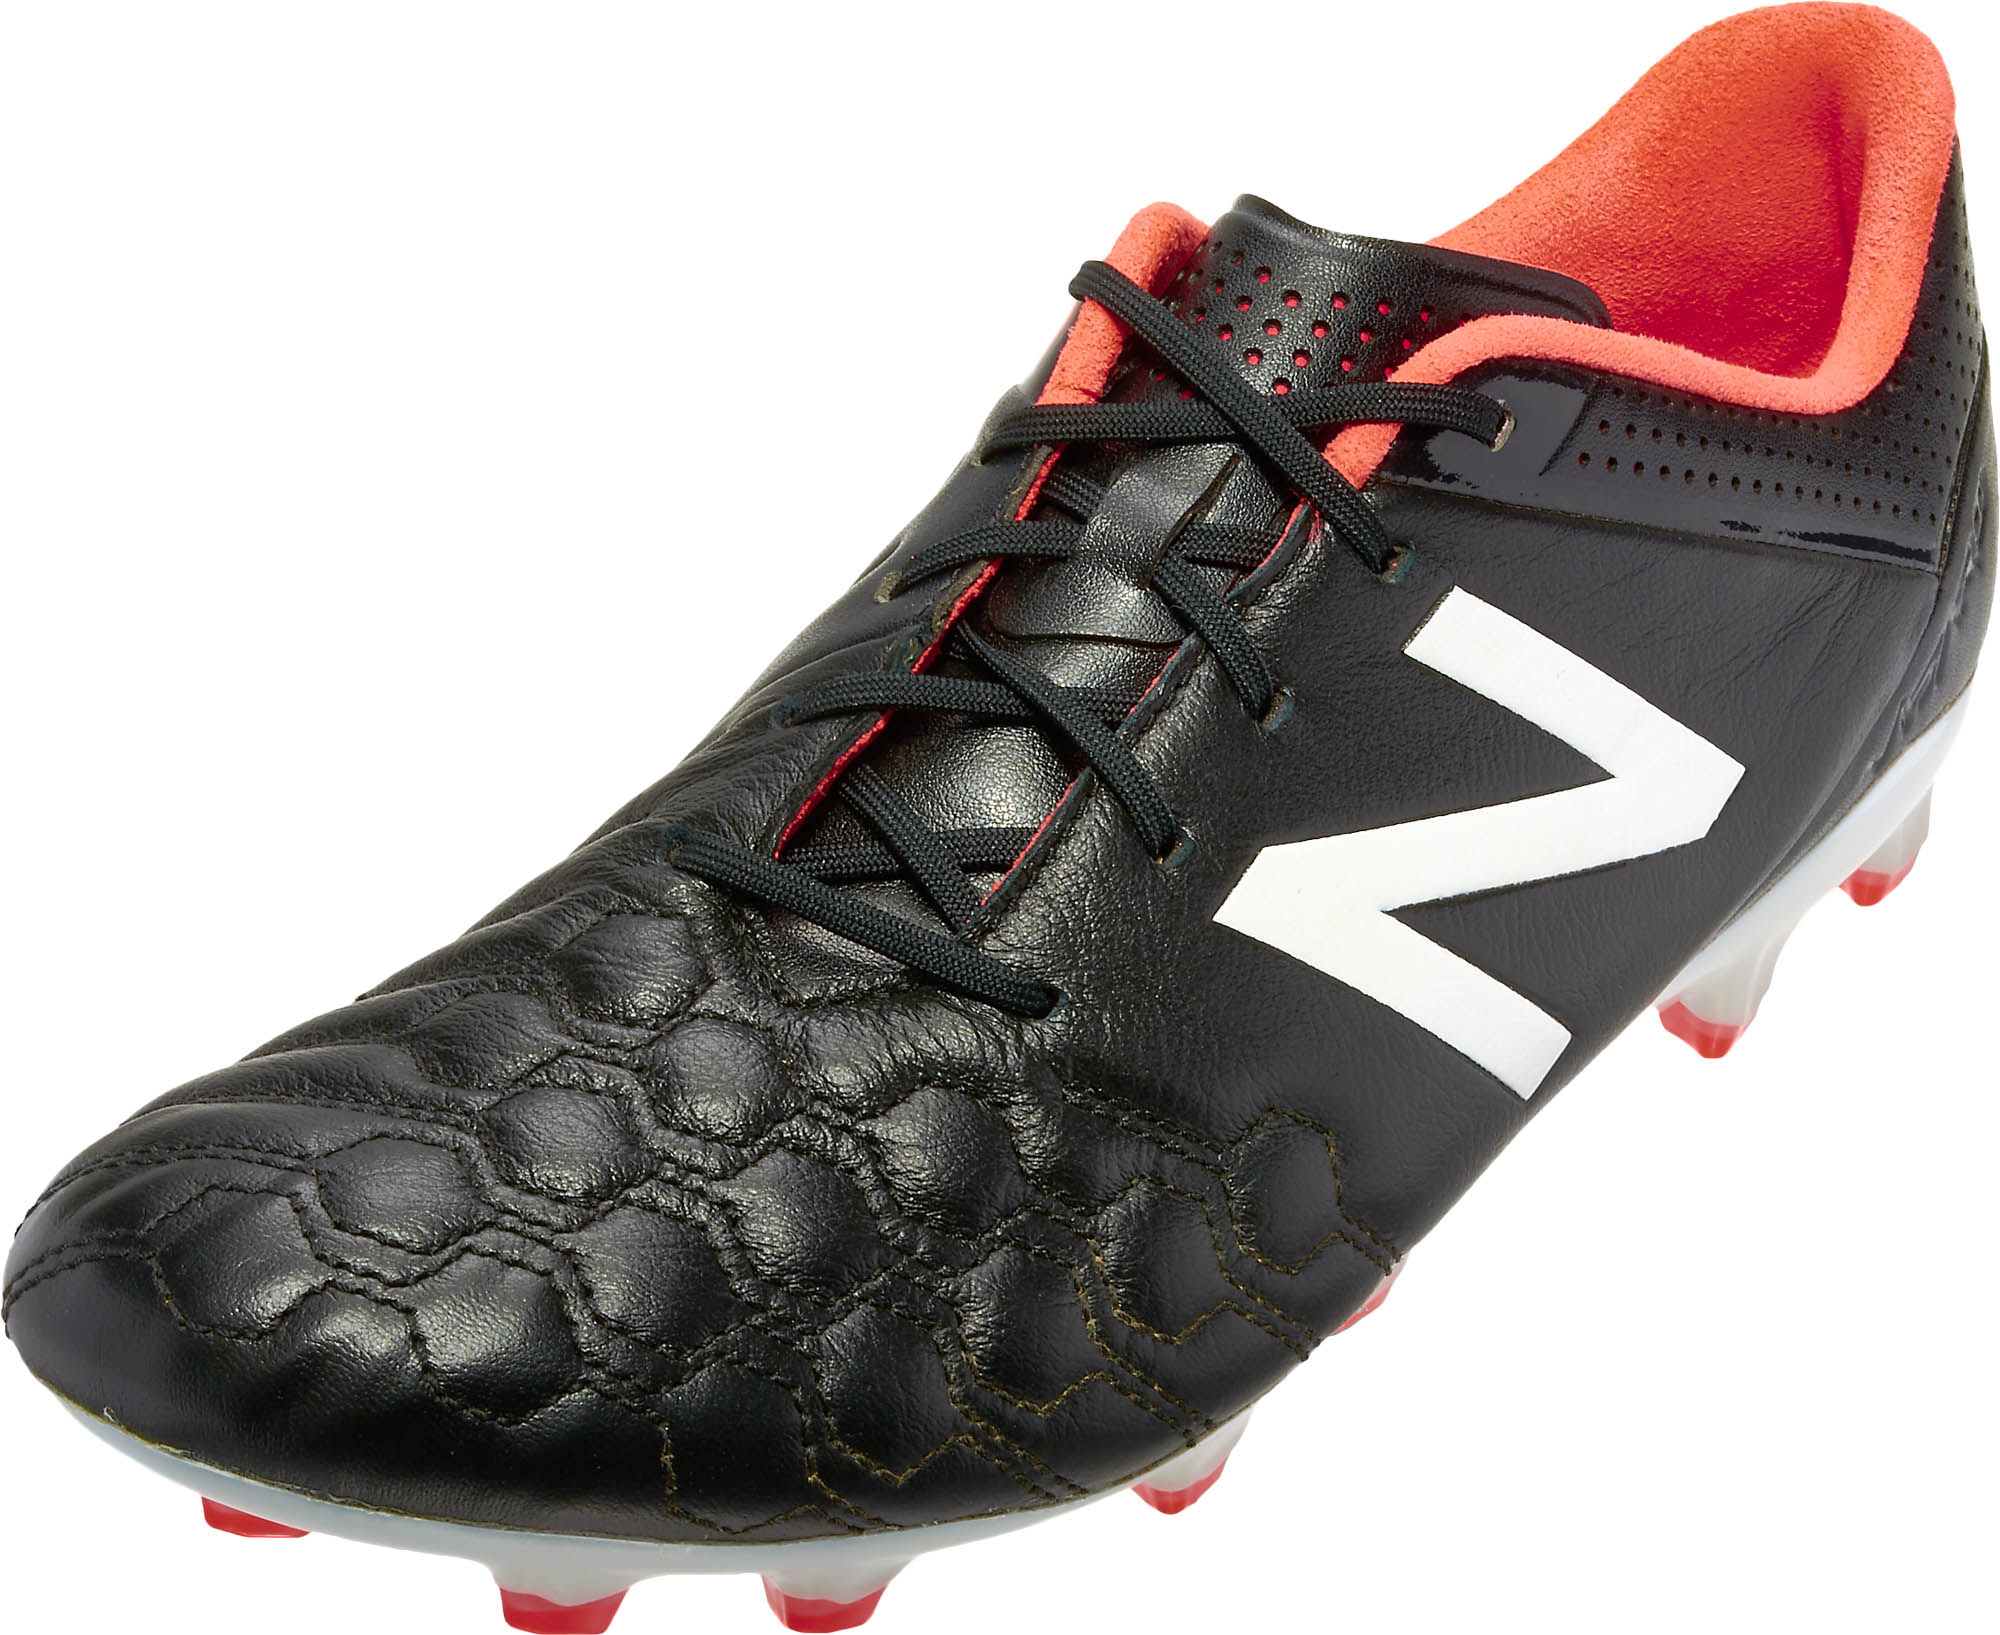 044c9a72ca093 New Balance K-Lite Visaro Cleats - Black New Balance Soccer Shoes